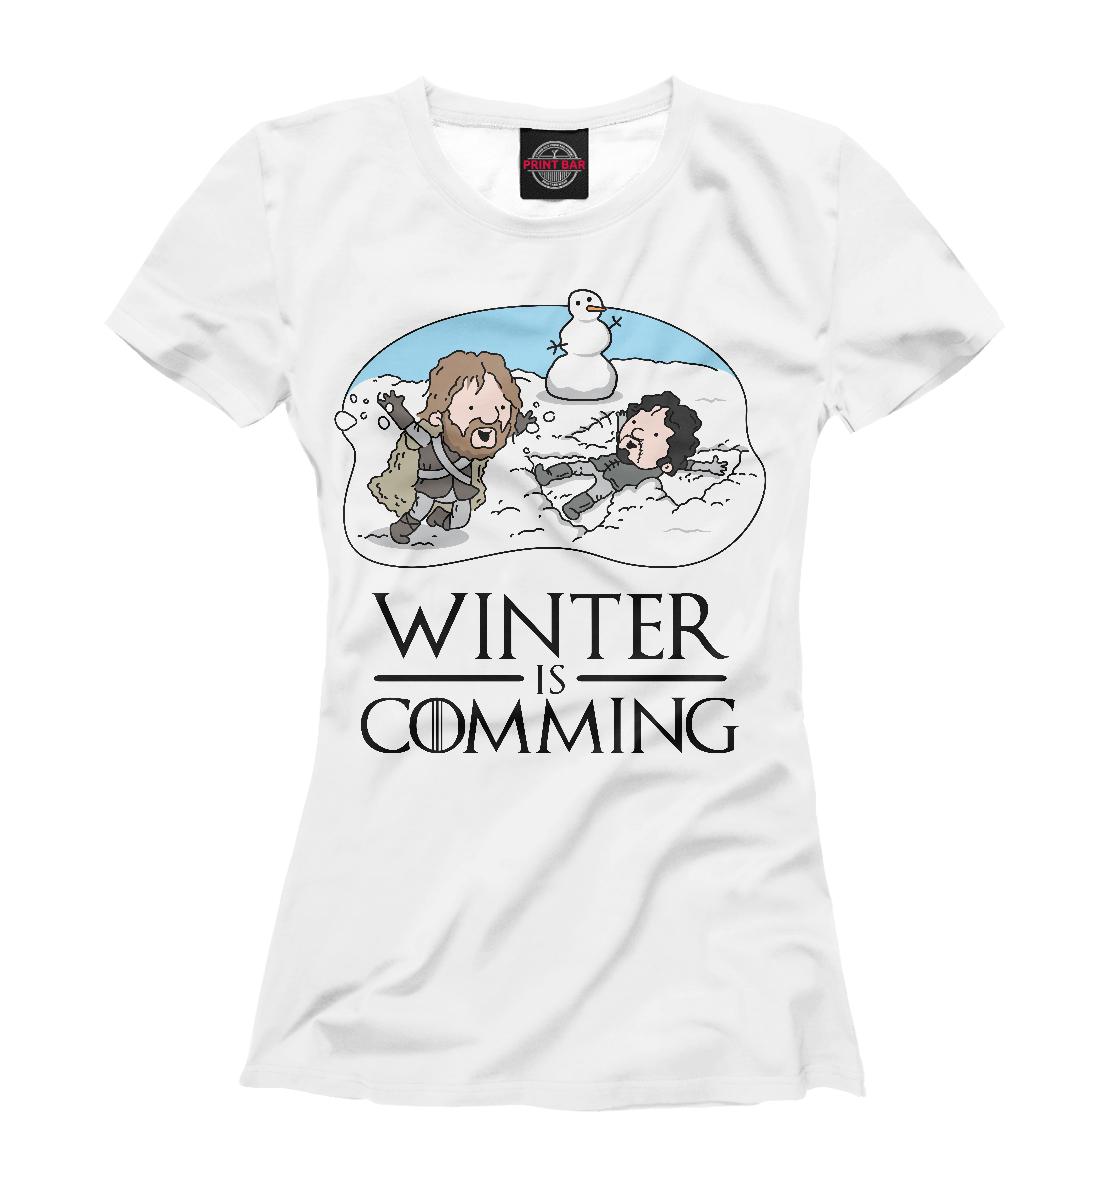 Купить Winter is comming, Printbar, Футболки, IGR-404632-fut-1